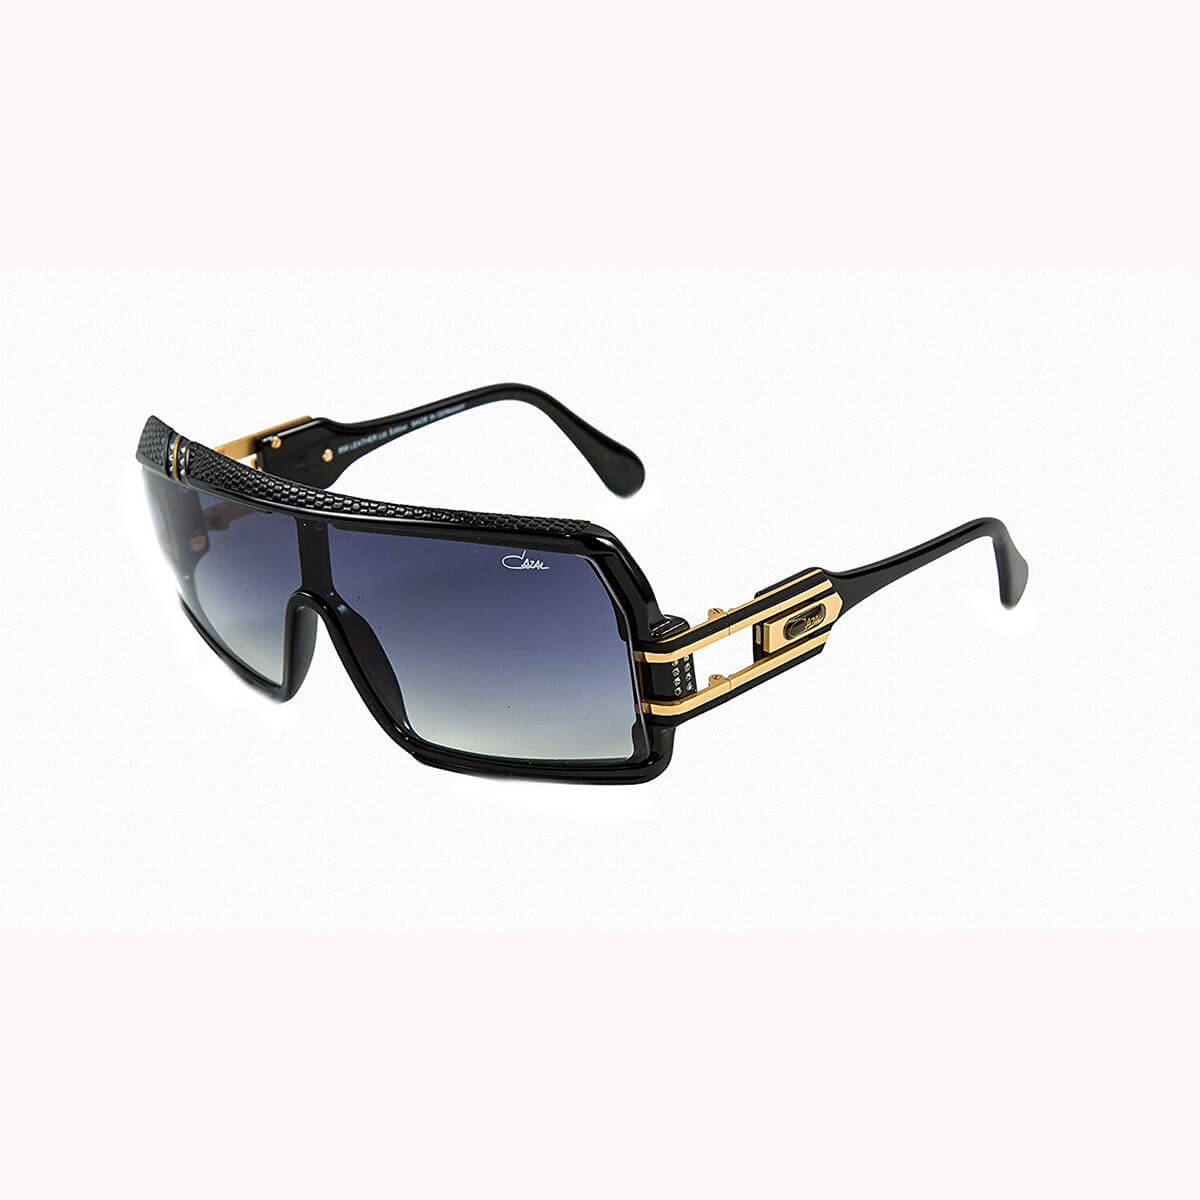 cb85520ee8 CAZAL Legends 858 603 Black Leather Snakeskin sunglasses